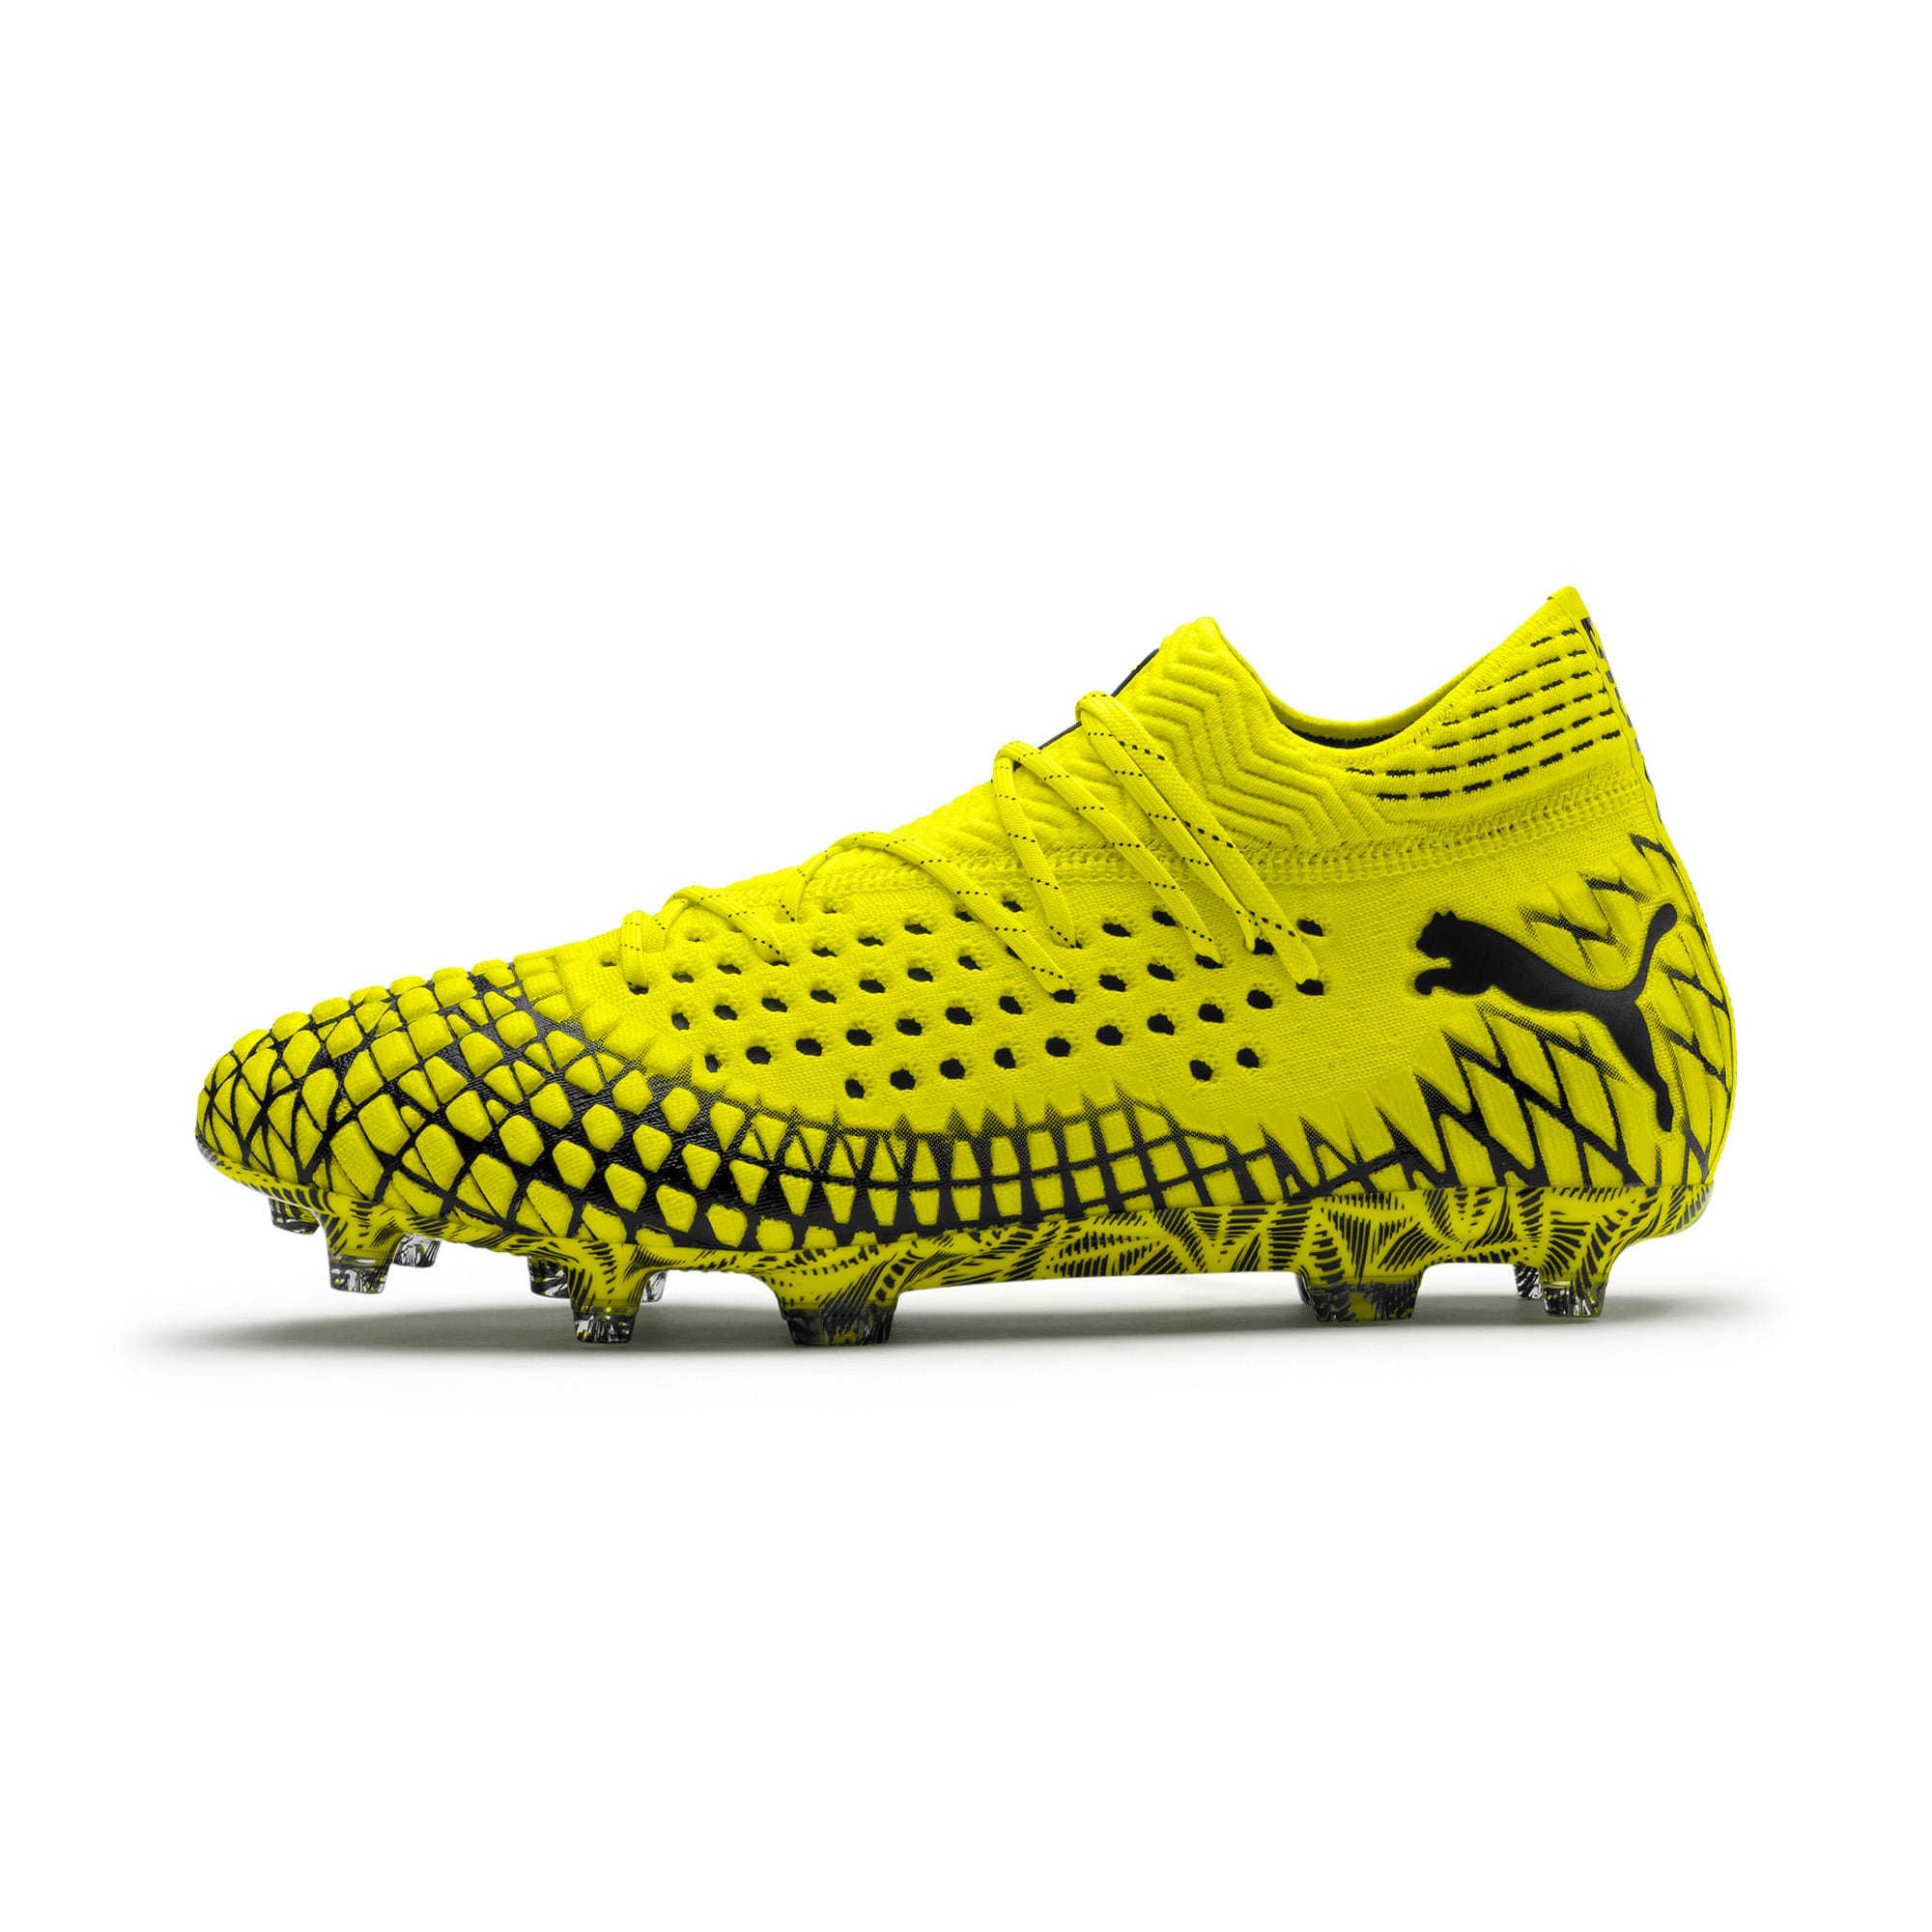 Thumbnail 1 of FUTURE 4.1 NETFIT FG/AG Men's Soccer Cleats, Yellow Alert-Puma Black, medium